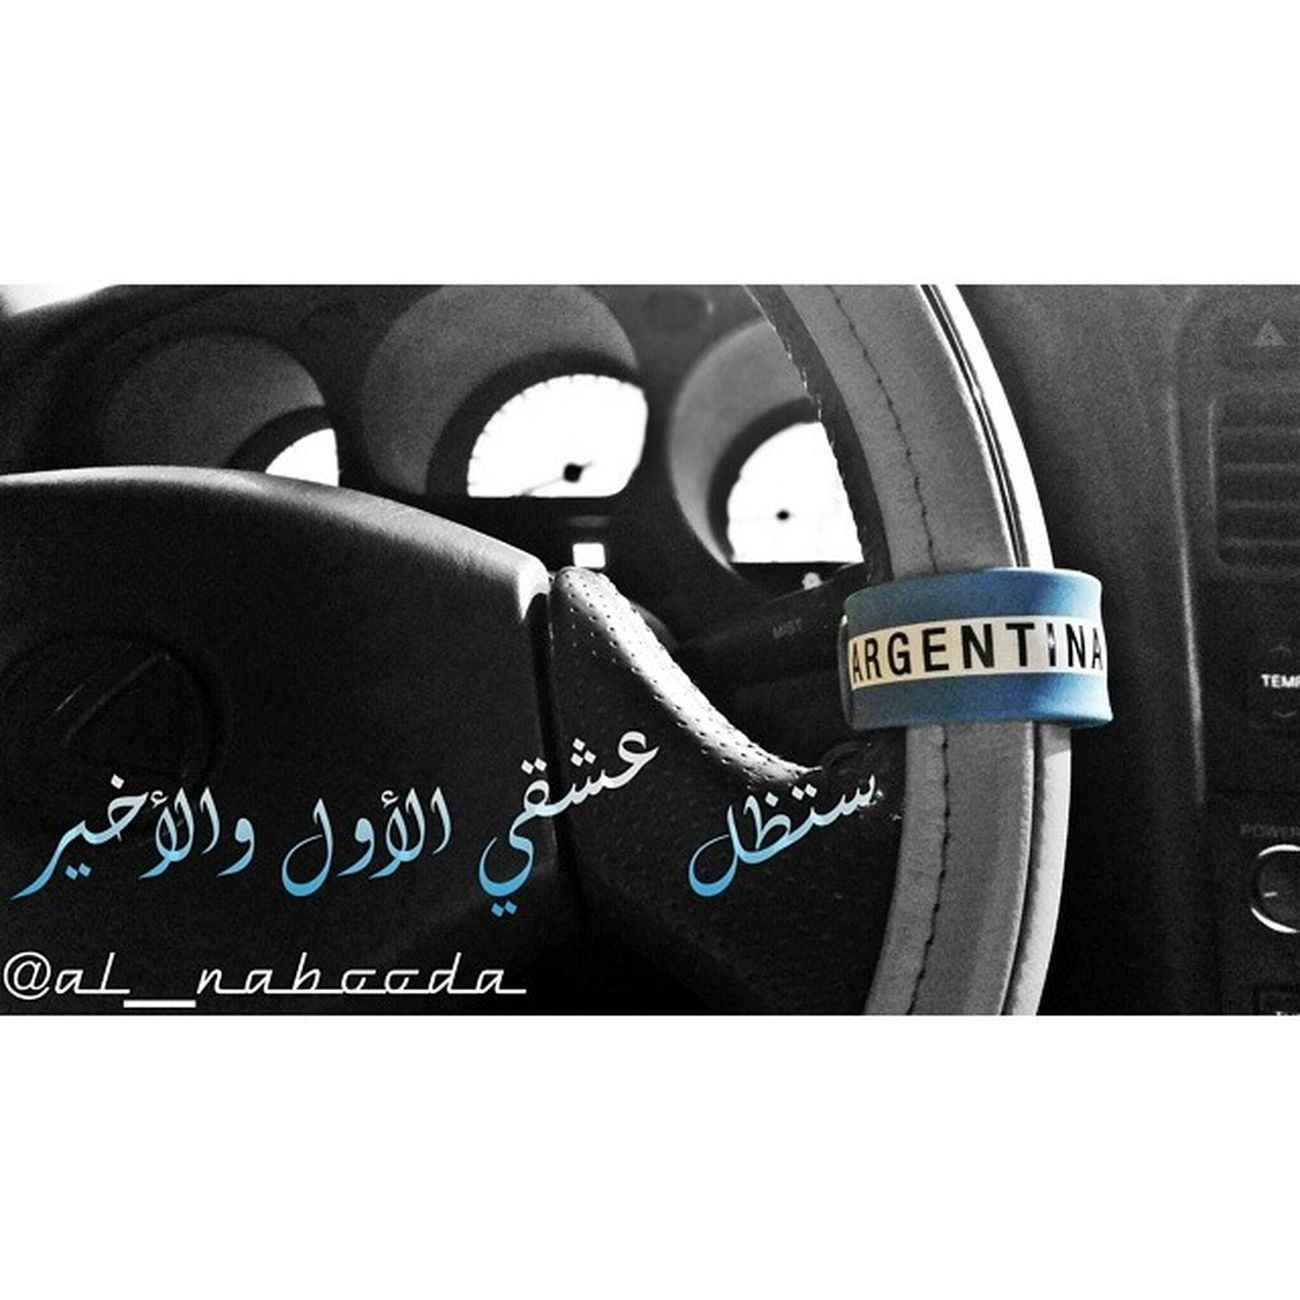 ستظل عشقي الاول والاخير تصميمي taken by my galaxy s5 and edited by me ad abudhabi dxb dubai shj sharjah qtr qatar ksa saudi kwt kuwait bahrain oman world cup